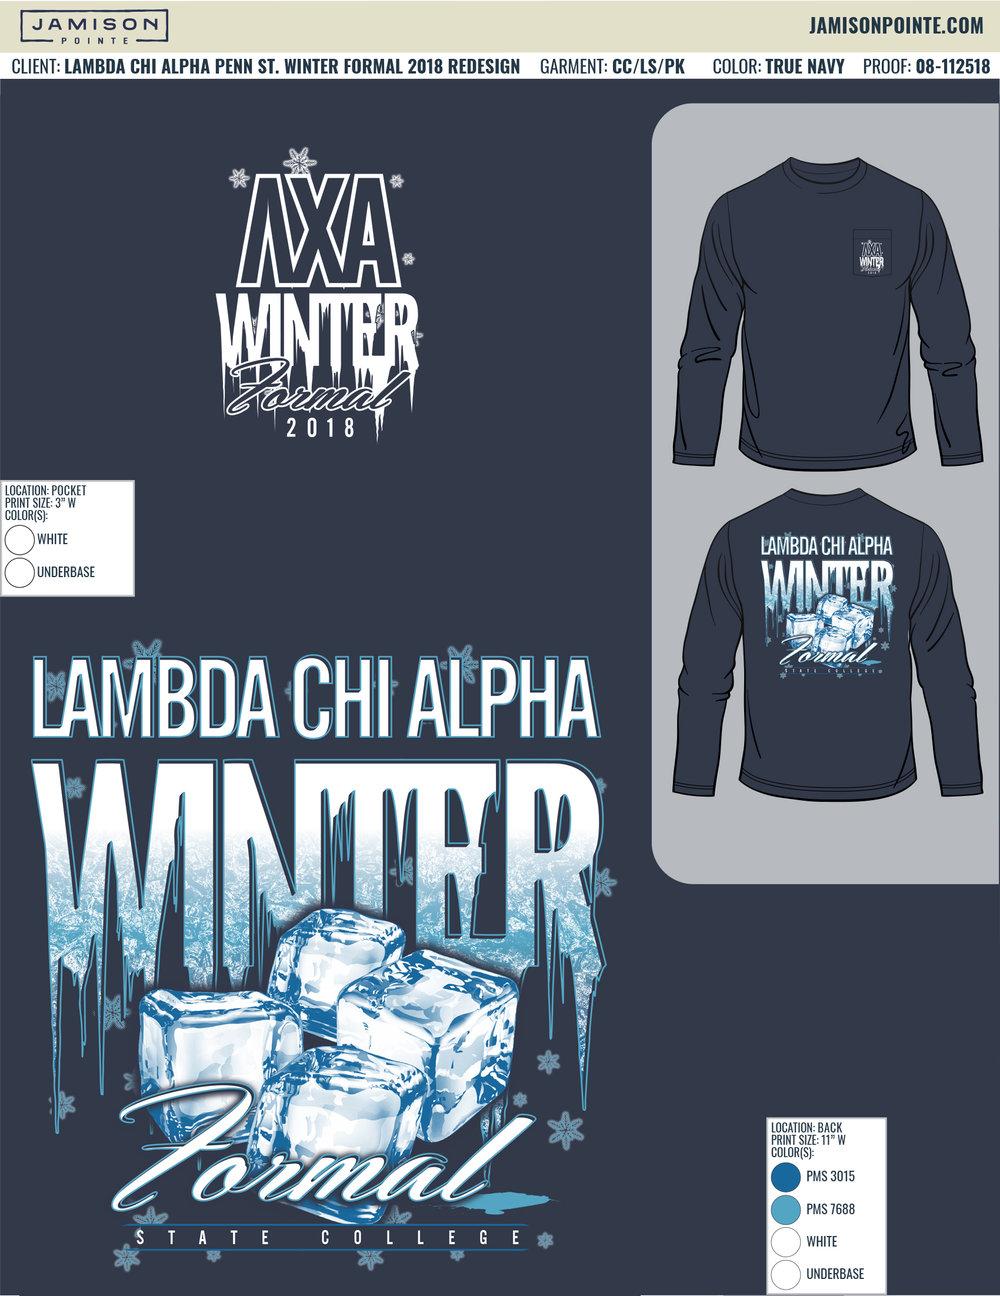 08-112518 Lambda Chi Alpha Penn State Winter Formal 2018 Redesign.jpg